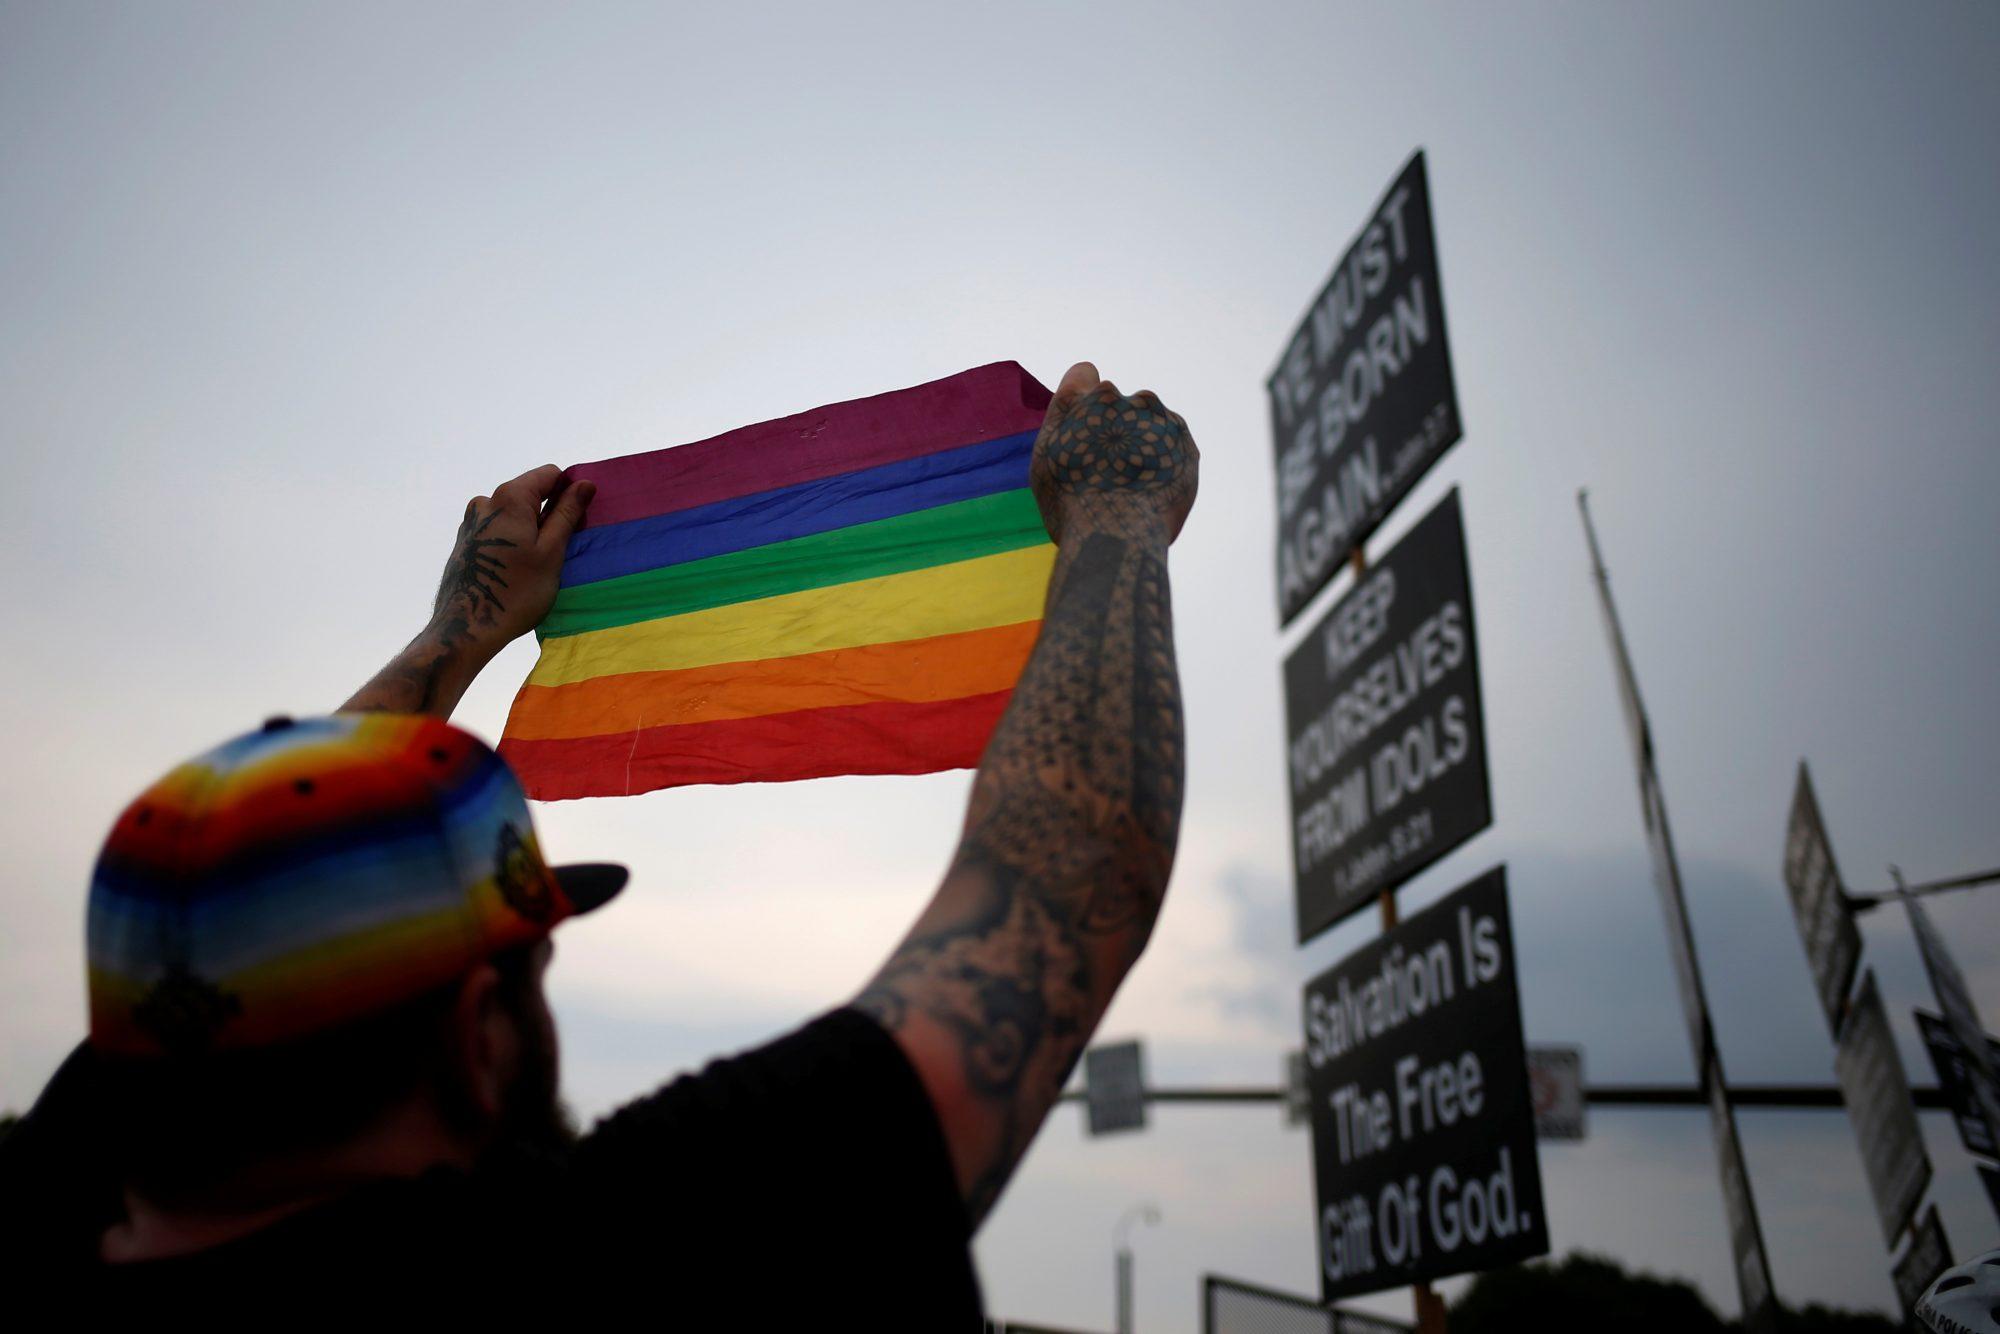 sud dakota transgender minori